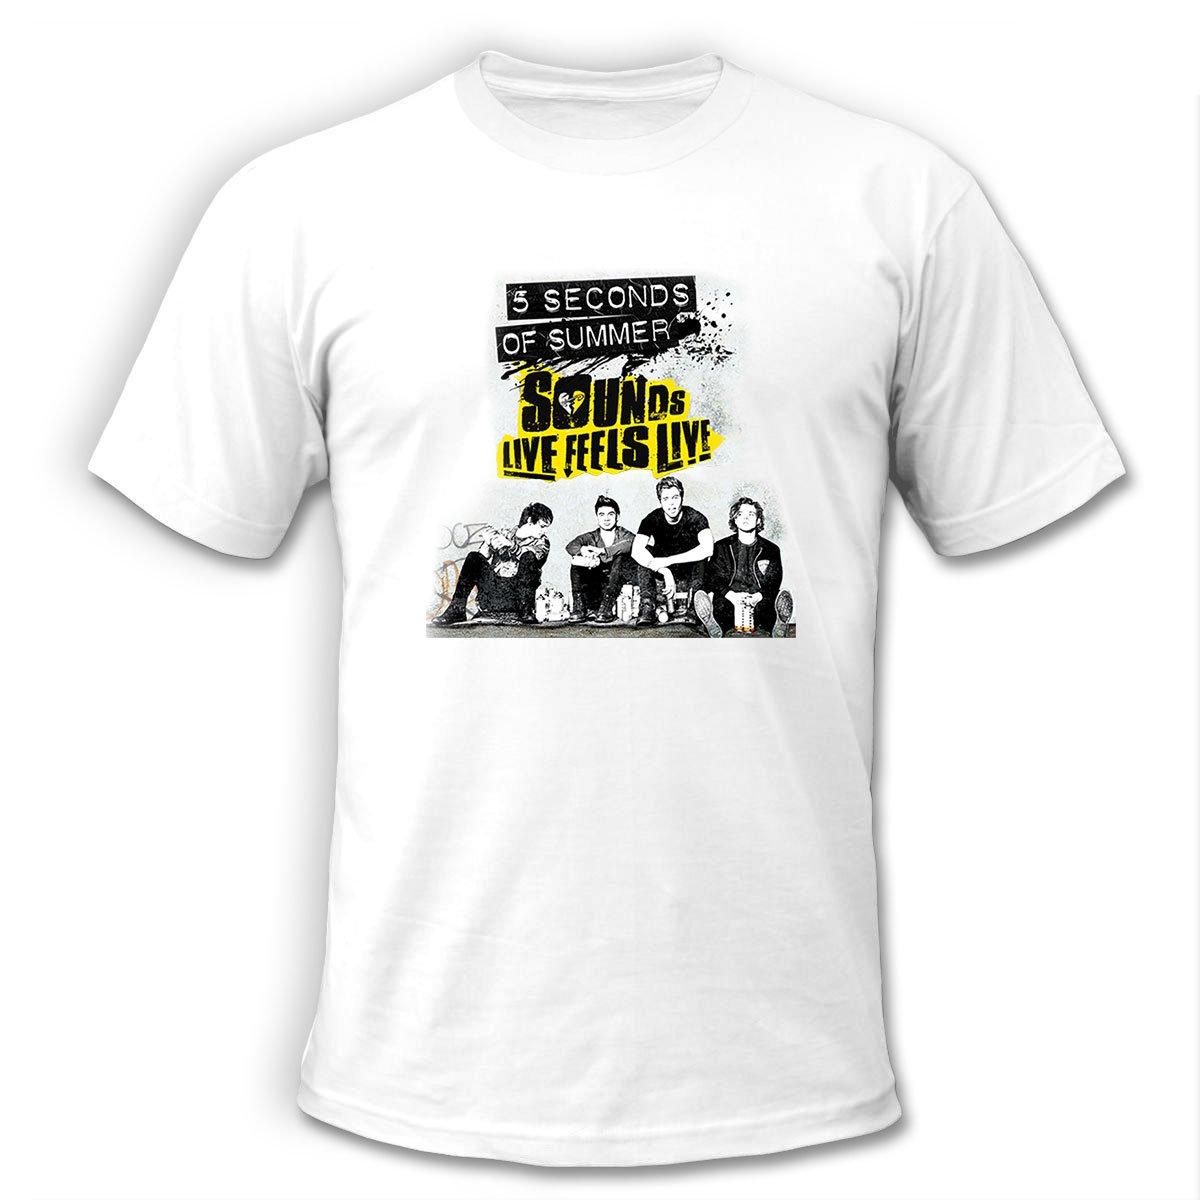 5 SOS Seconds of Summer Tour 2016 Show Concert scedules White T-Shirt